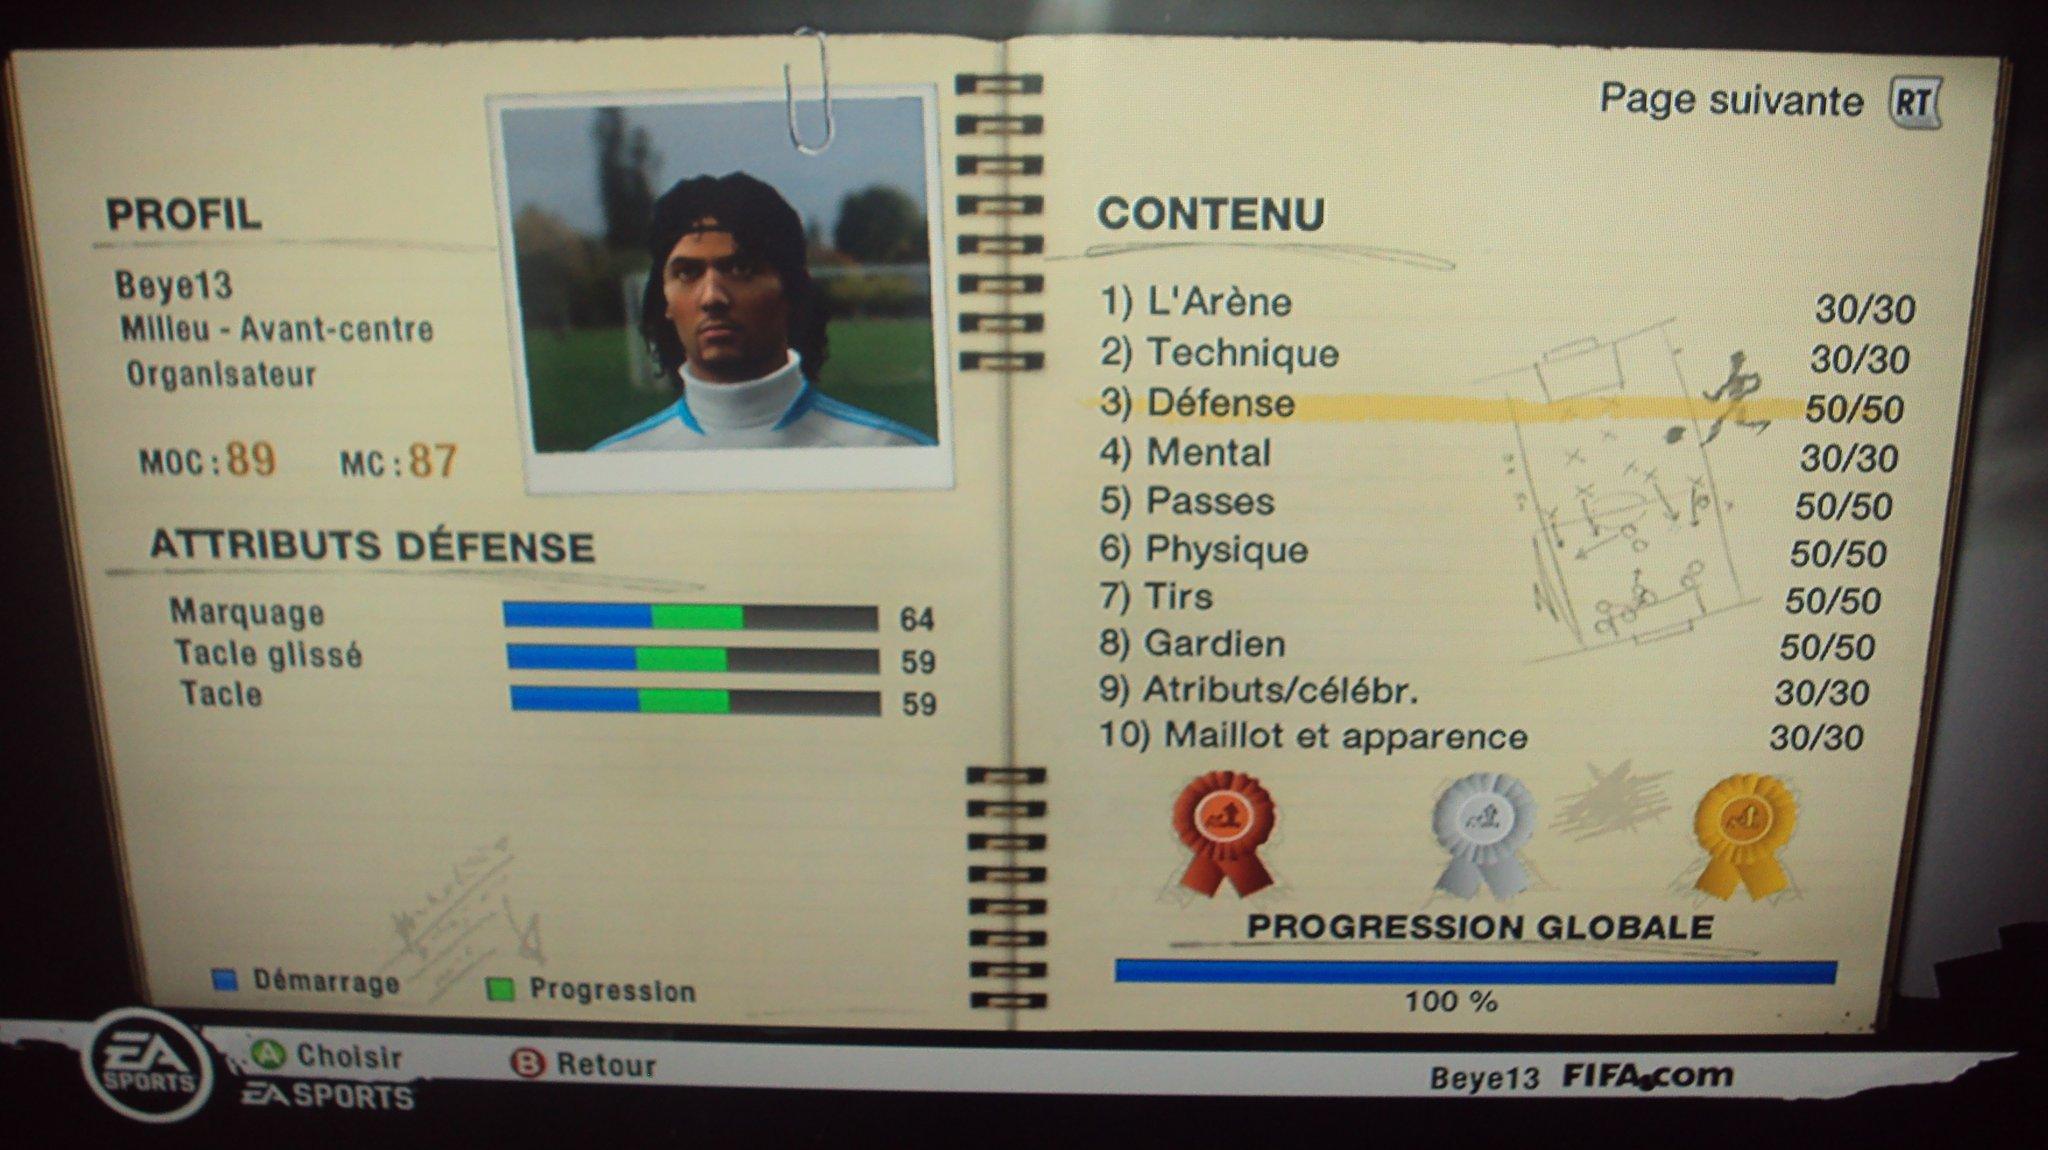 [Jeu Vidéo] FIFA 11 (version 2) - Page 8 569933195001201050498268412455387202463203371886o